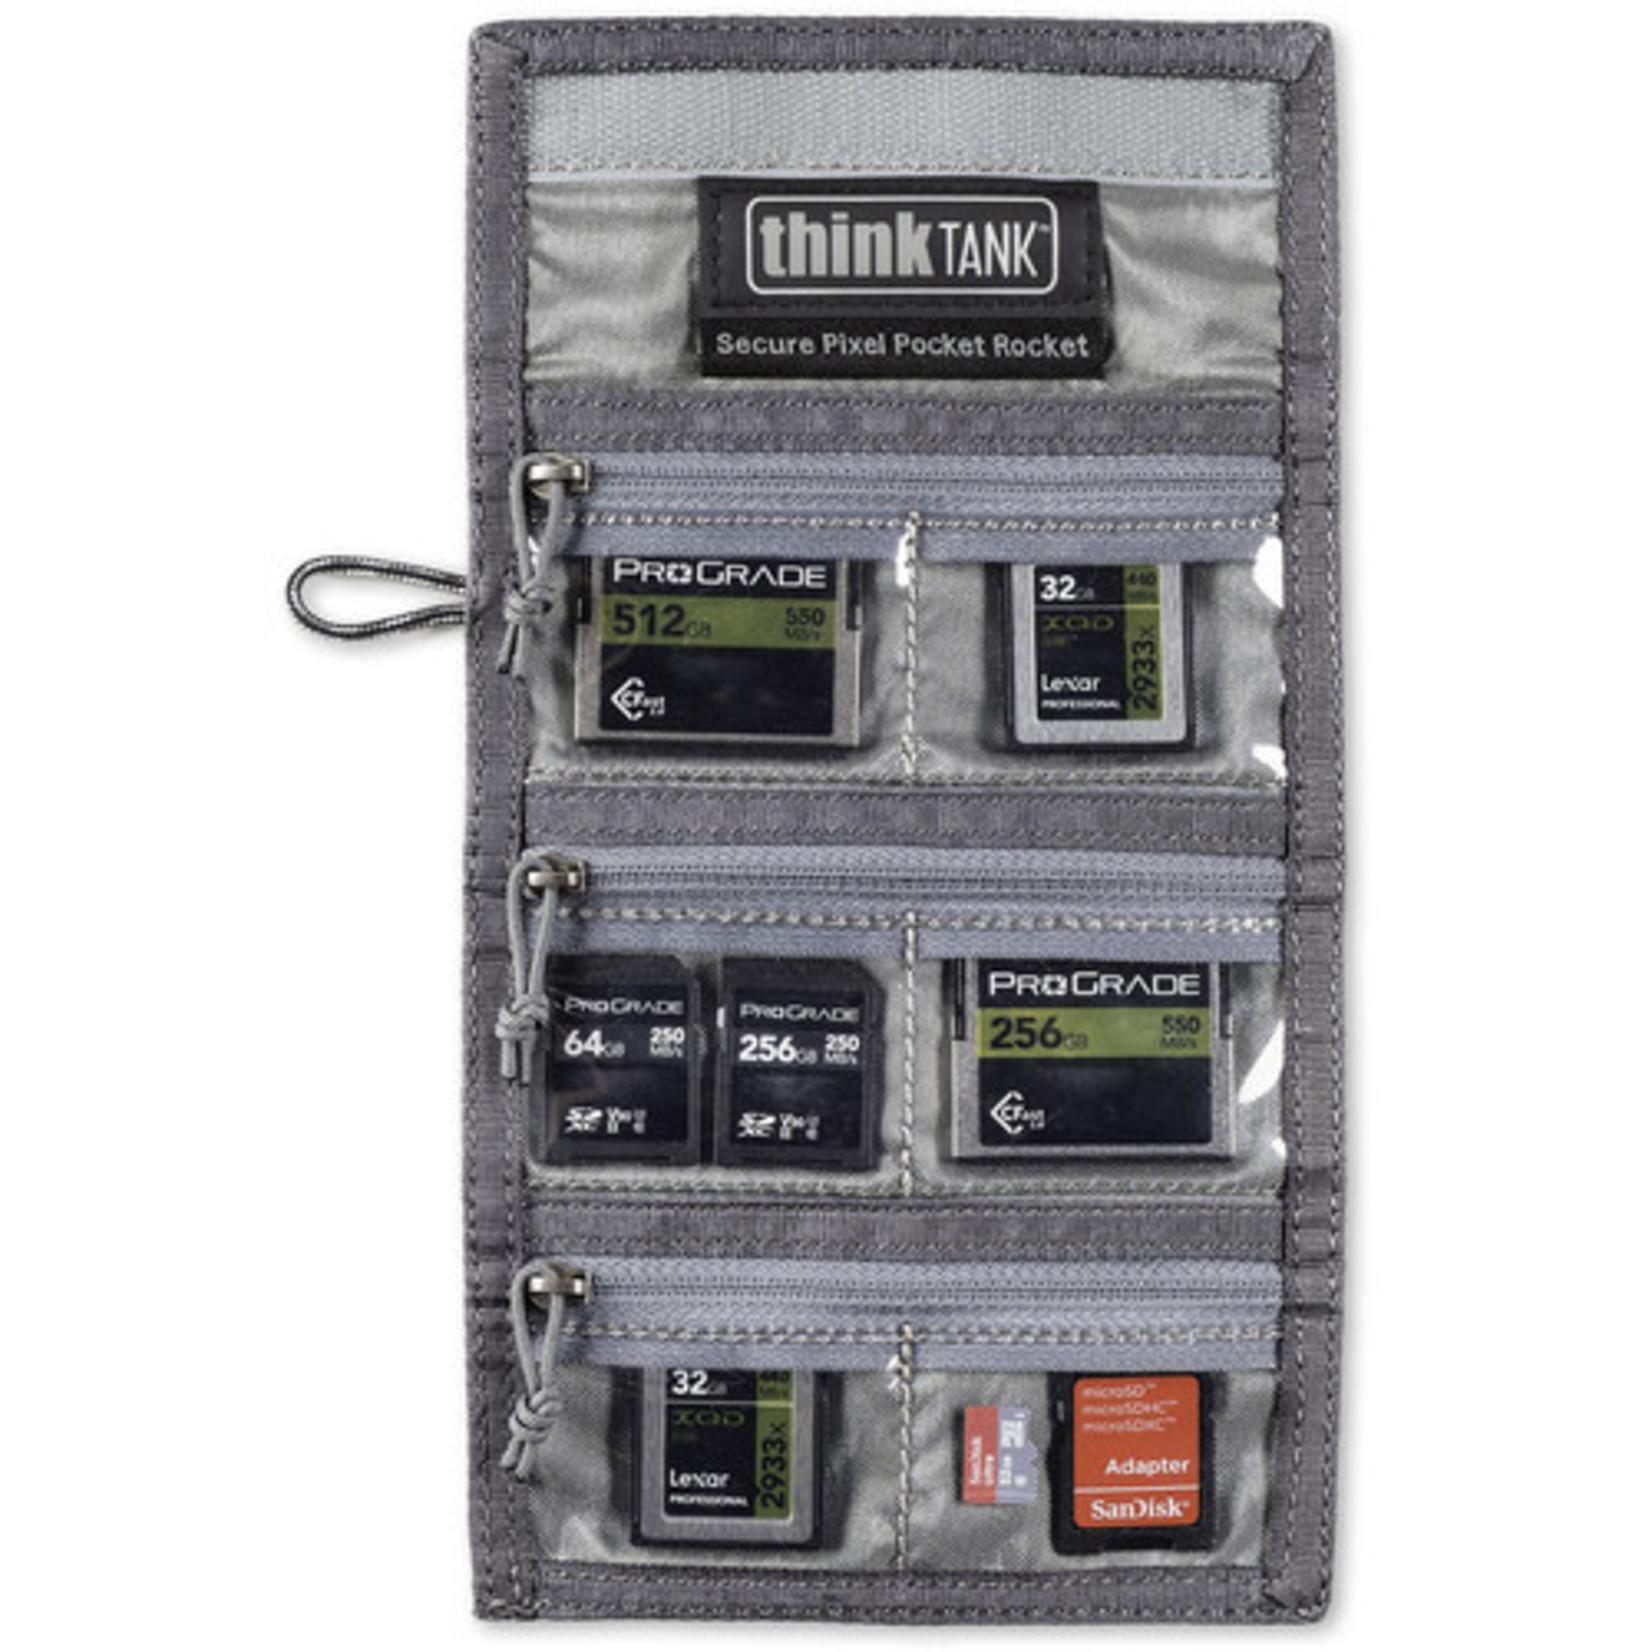 ThinkTank Secure Pixel Pocket Rocket - Black